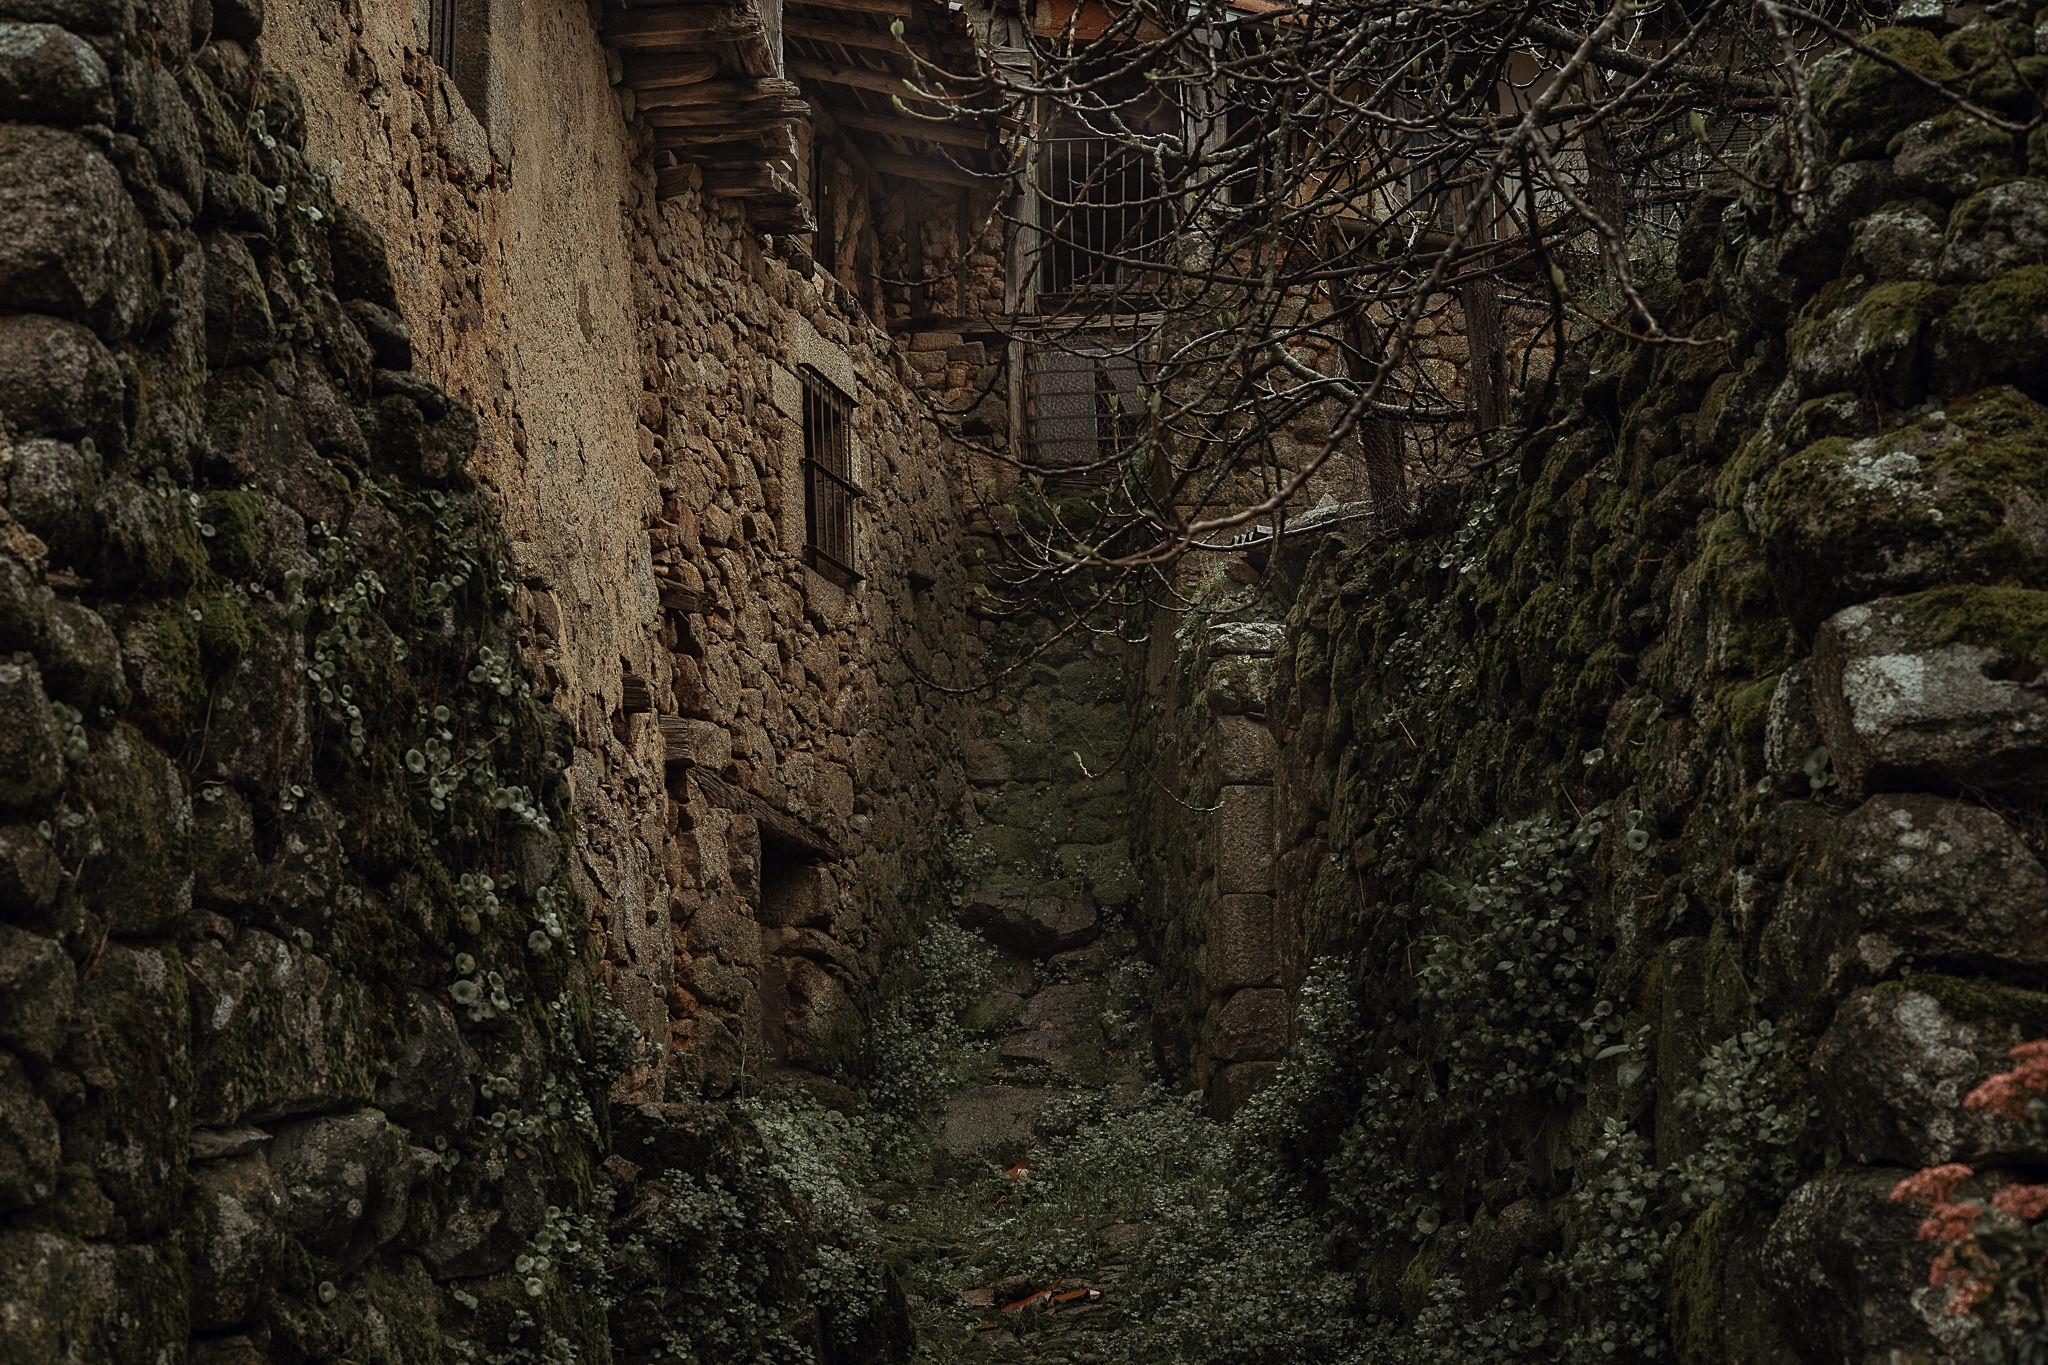 Fotografo-FedeGrau-Visions_in_Ruins-10.jpg